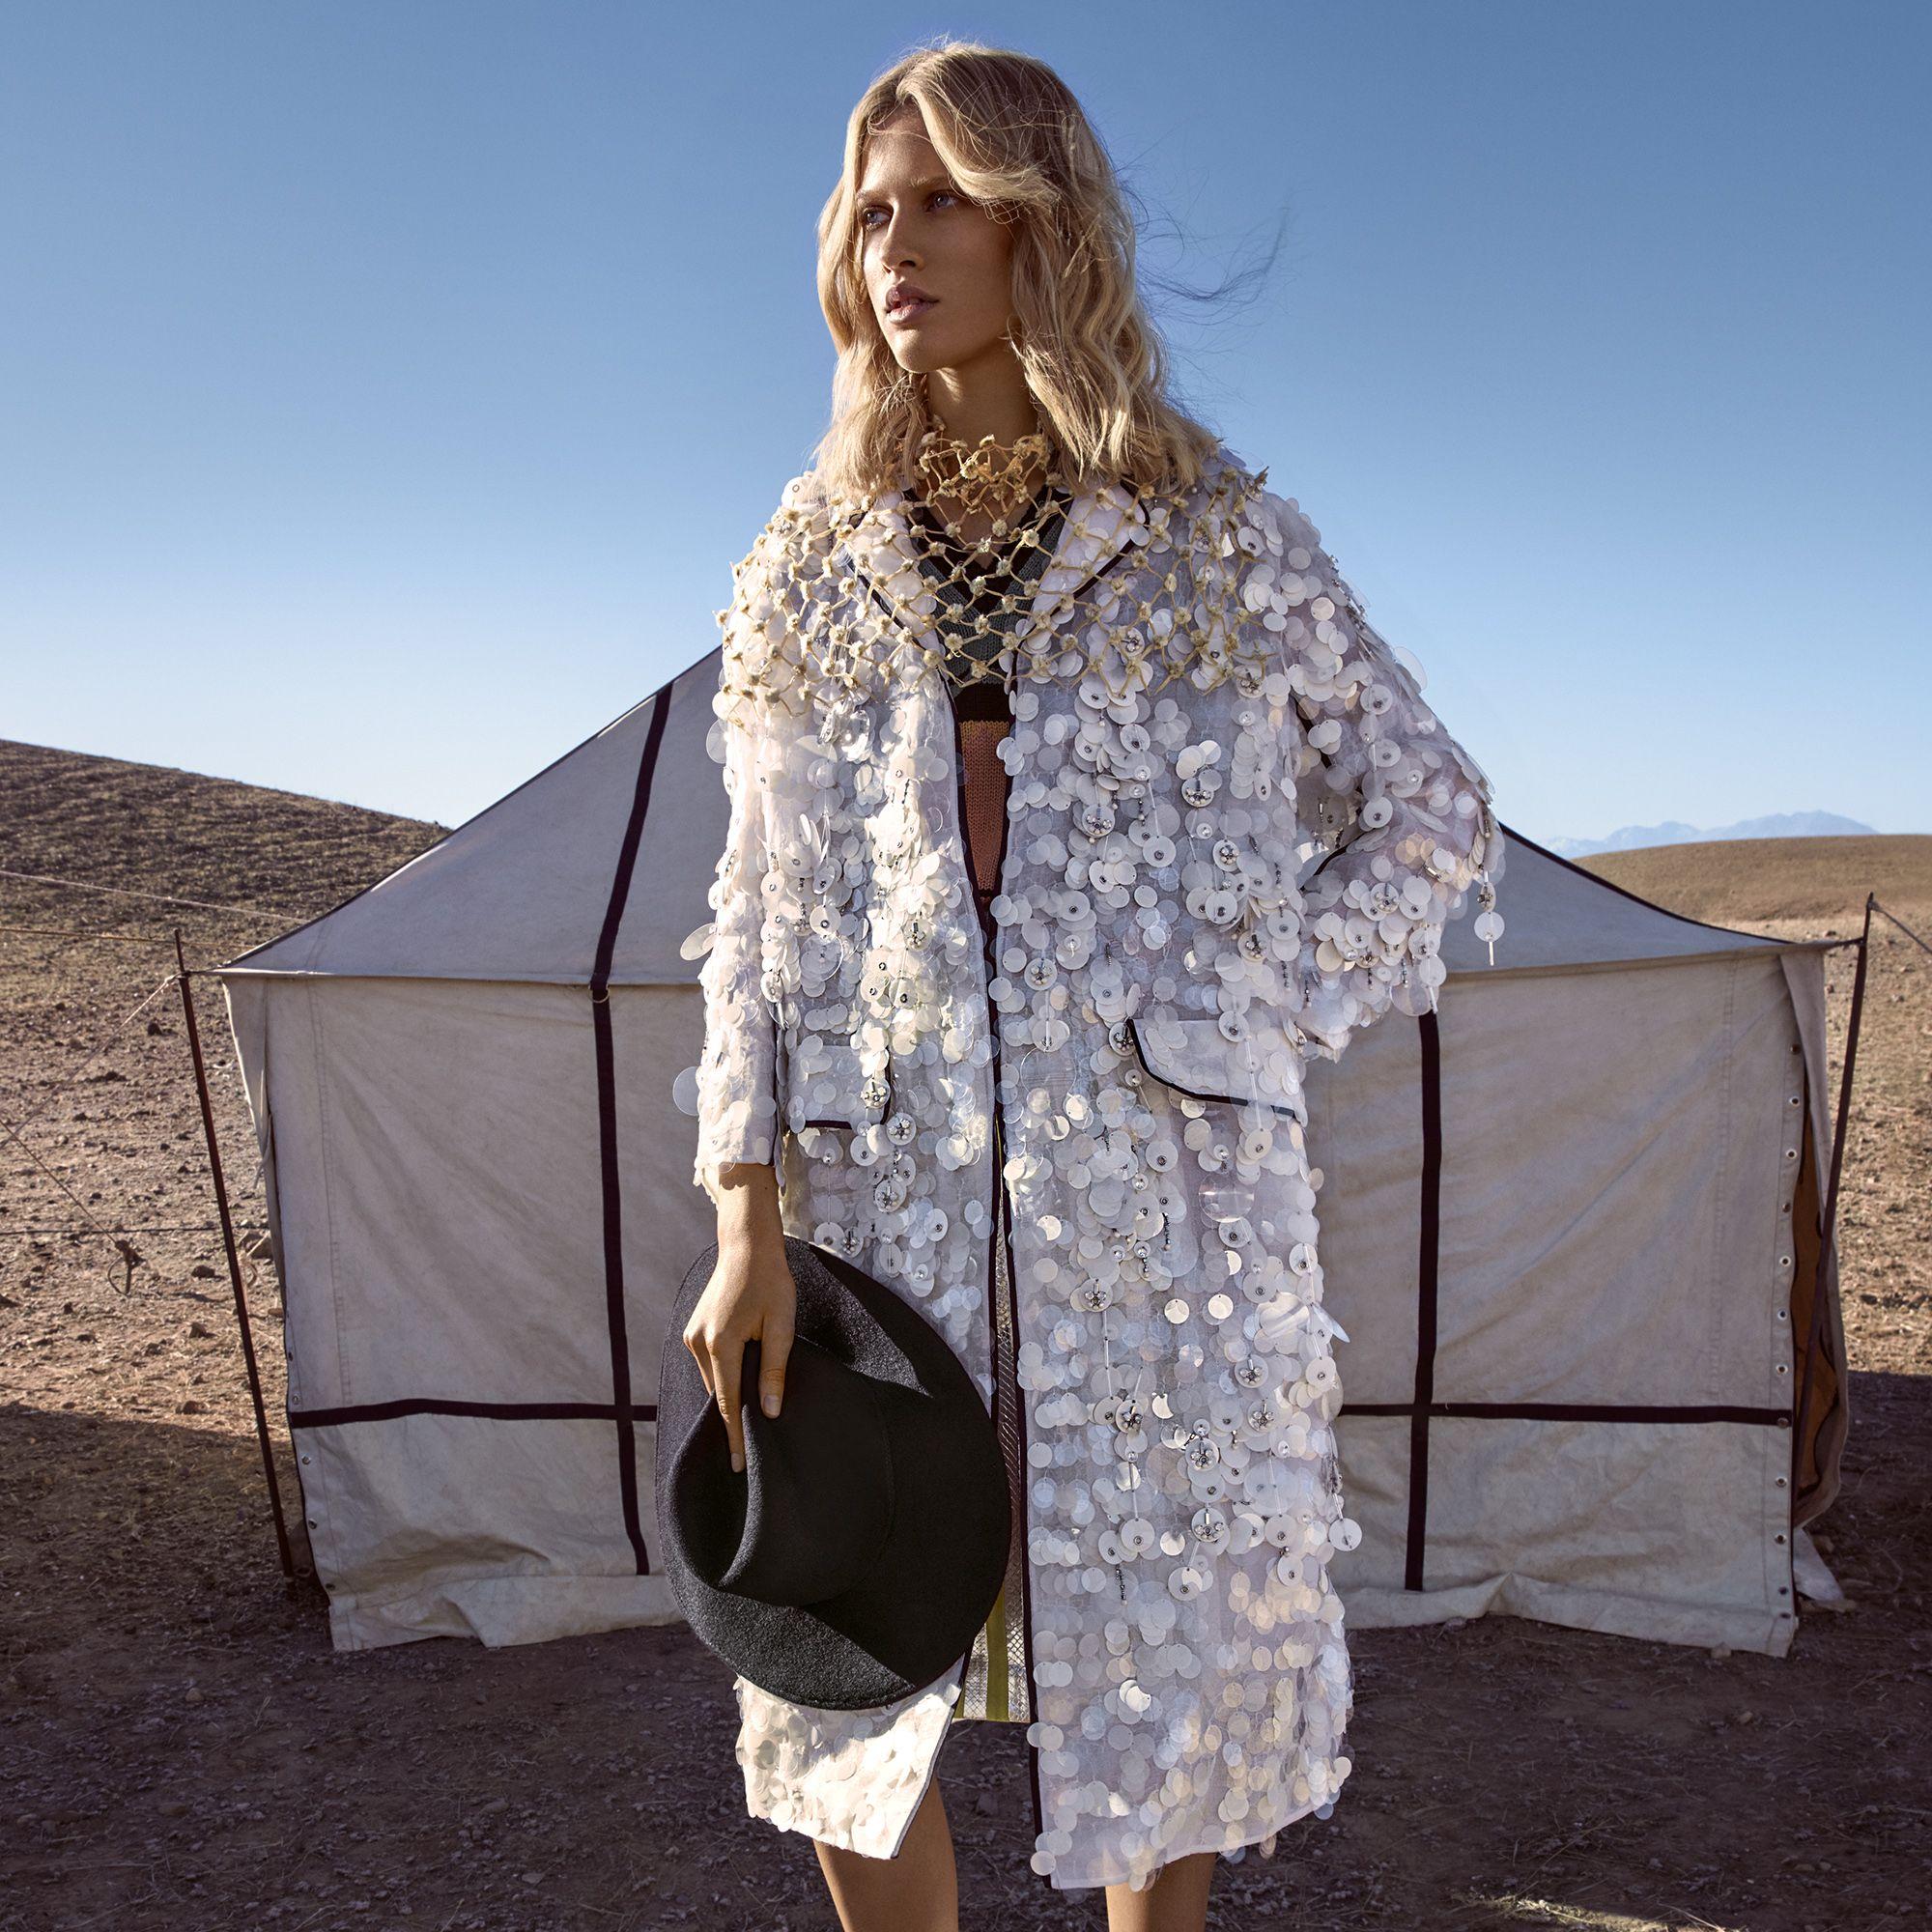 "<p><strong>Prada </strong>coat, $12,820, sweater-vest, $1,190, skirt, $5,280, and neckpiece, $525, <a href=""http://prada.com"" target=""_blank"">prada.com</a>&#x3B; <strong>Satya Twena </strong>hat (worn throughout), $425, <a href=""http://satyatweena.com"" target=""_blank"">satyatweena.com</a>&#x3B; <strong>Céline</strong> boots (worn throughout), $1,750, 212-420-7300. </p>"